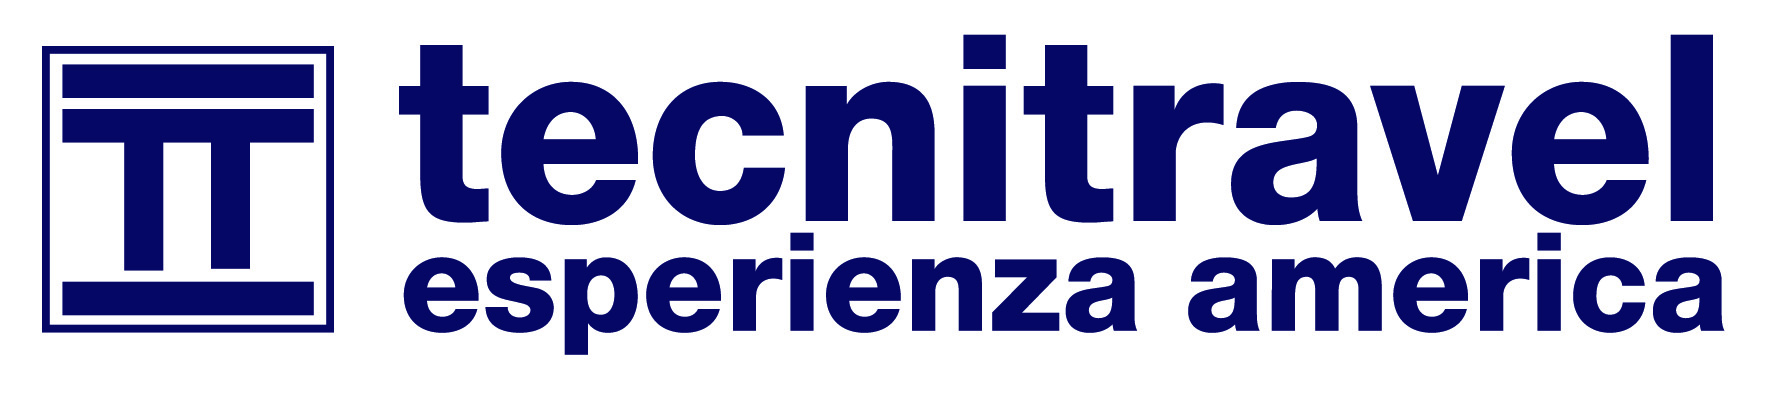 Logo TECNITRAVEL SRL - ESPERIENZA AMERICANA